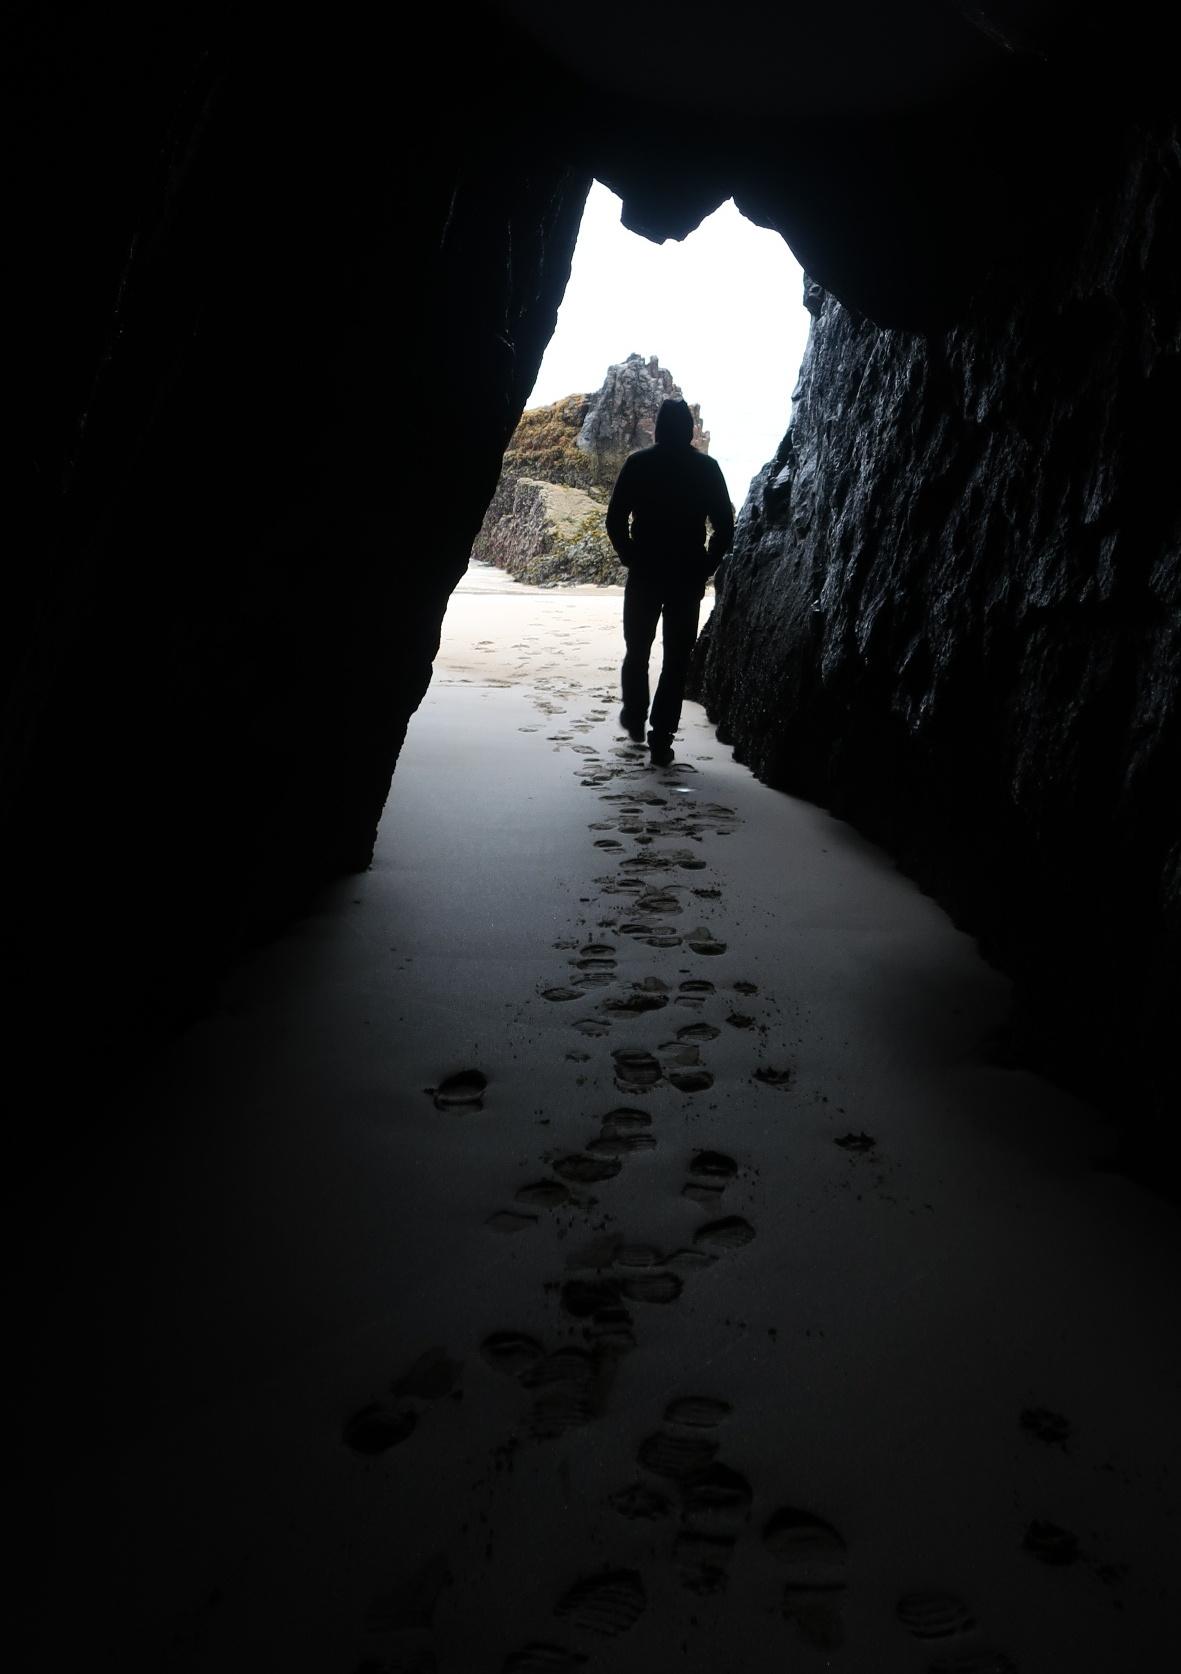 Caverns at low tide